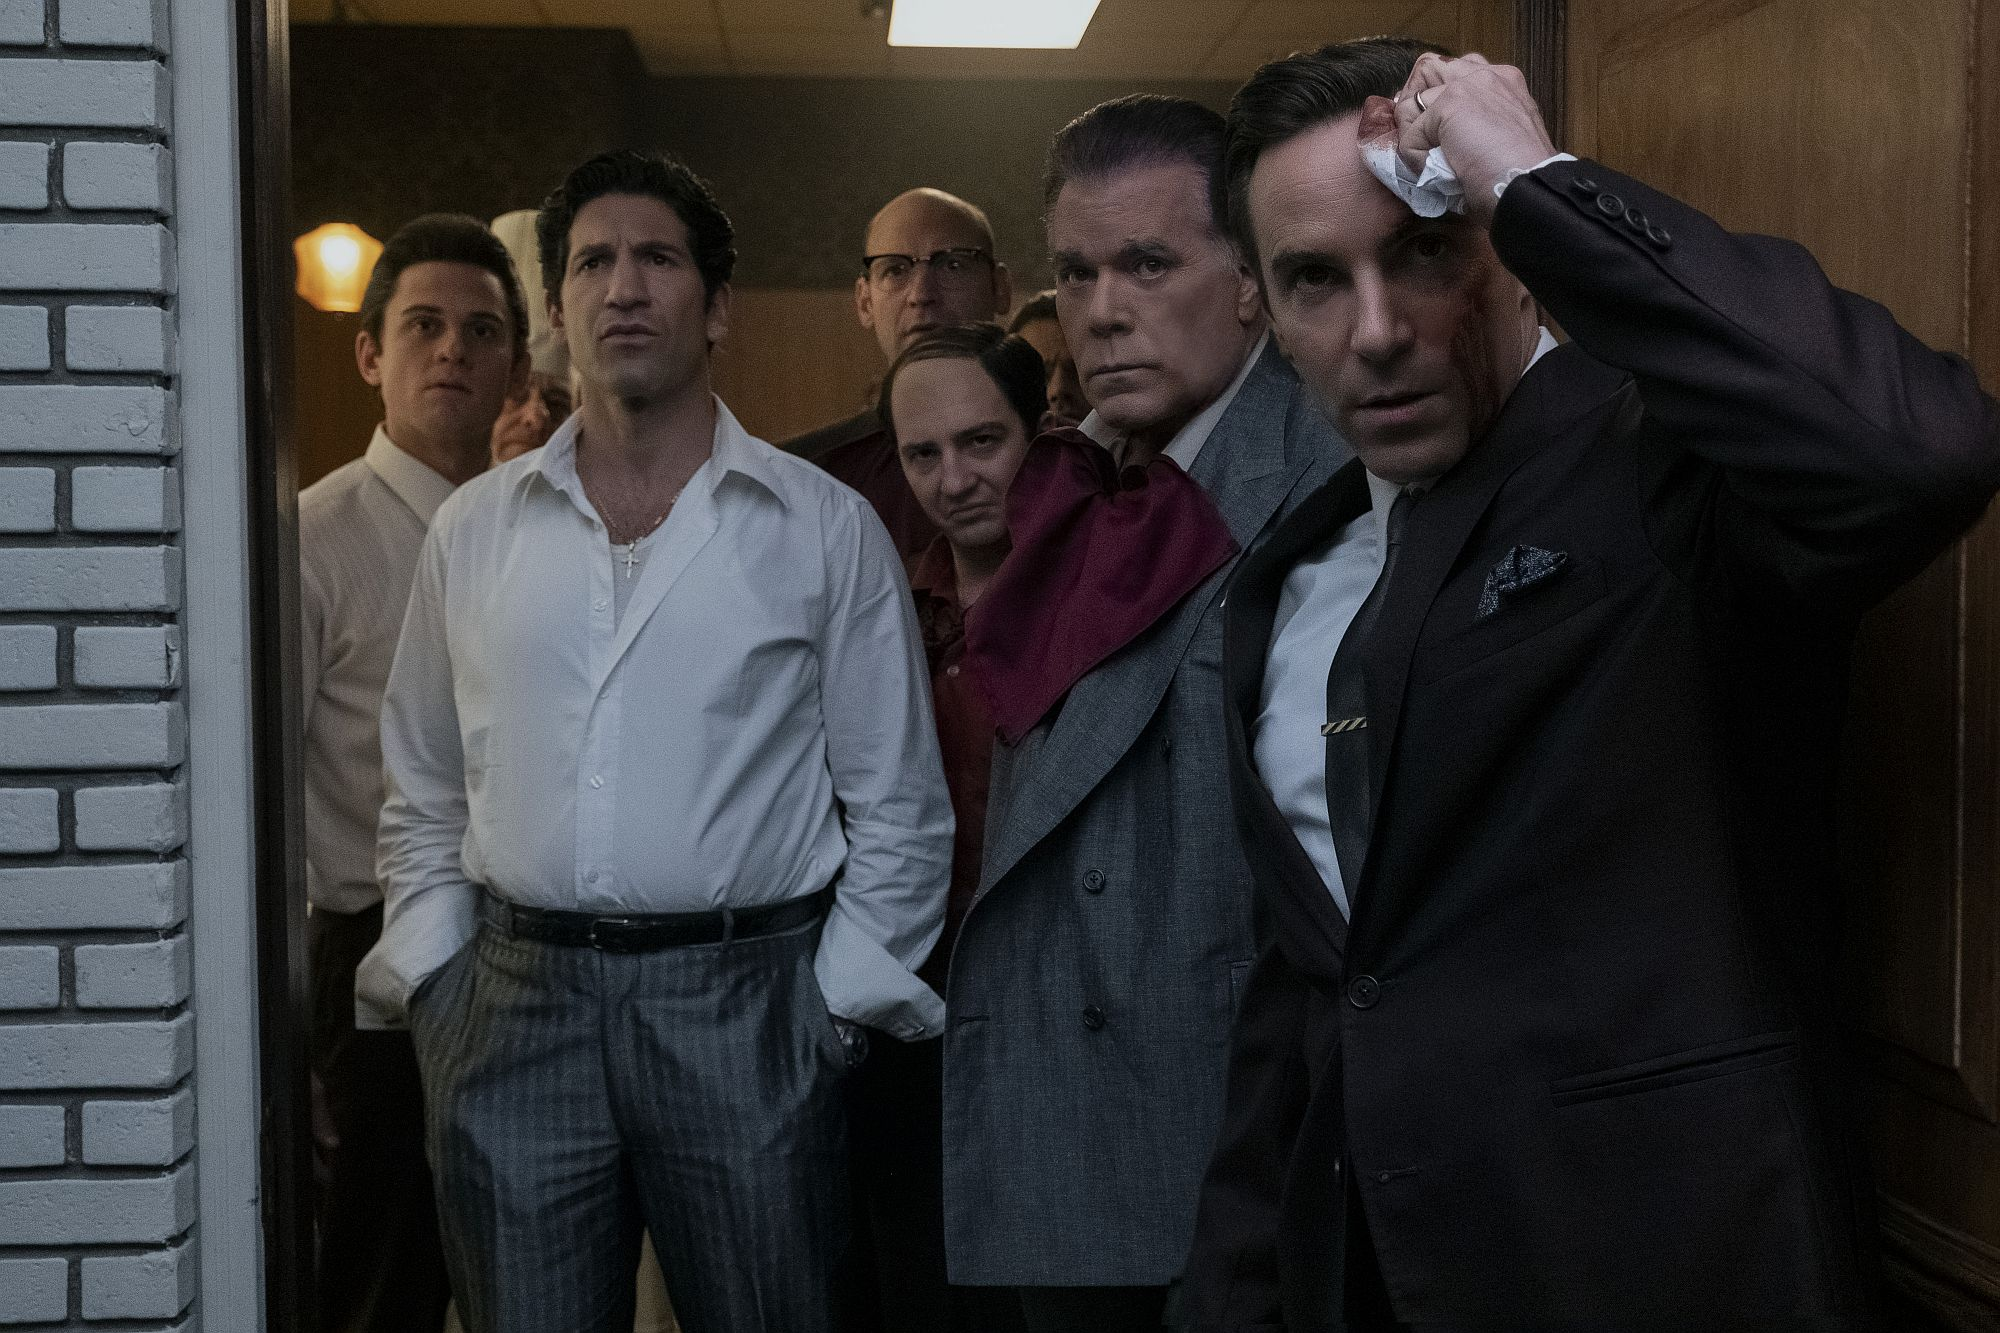 "(L-r) BILLY MAGNUSSEN als Paulie Walnuts, JON BERNTHAL als Johnny Soprano, COREY STOLL als Junior Soprano (im Hintergrung), JOHN MAGARO als Silvio Dante, RAY LIOTTA als ""Hollywood Dick"" Moltisanti und ALESSANDRO NIVOLA als Dickie Moltisanti."